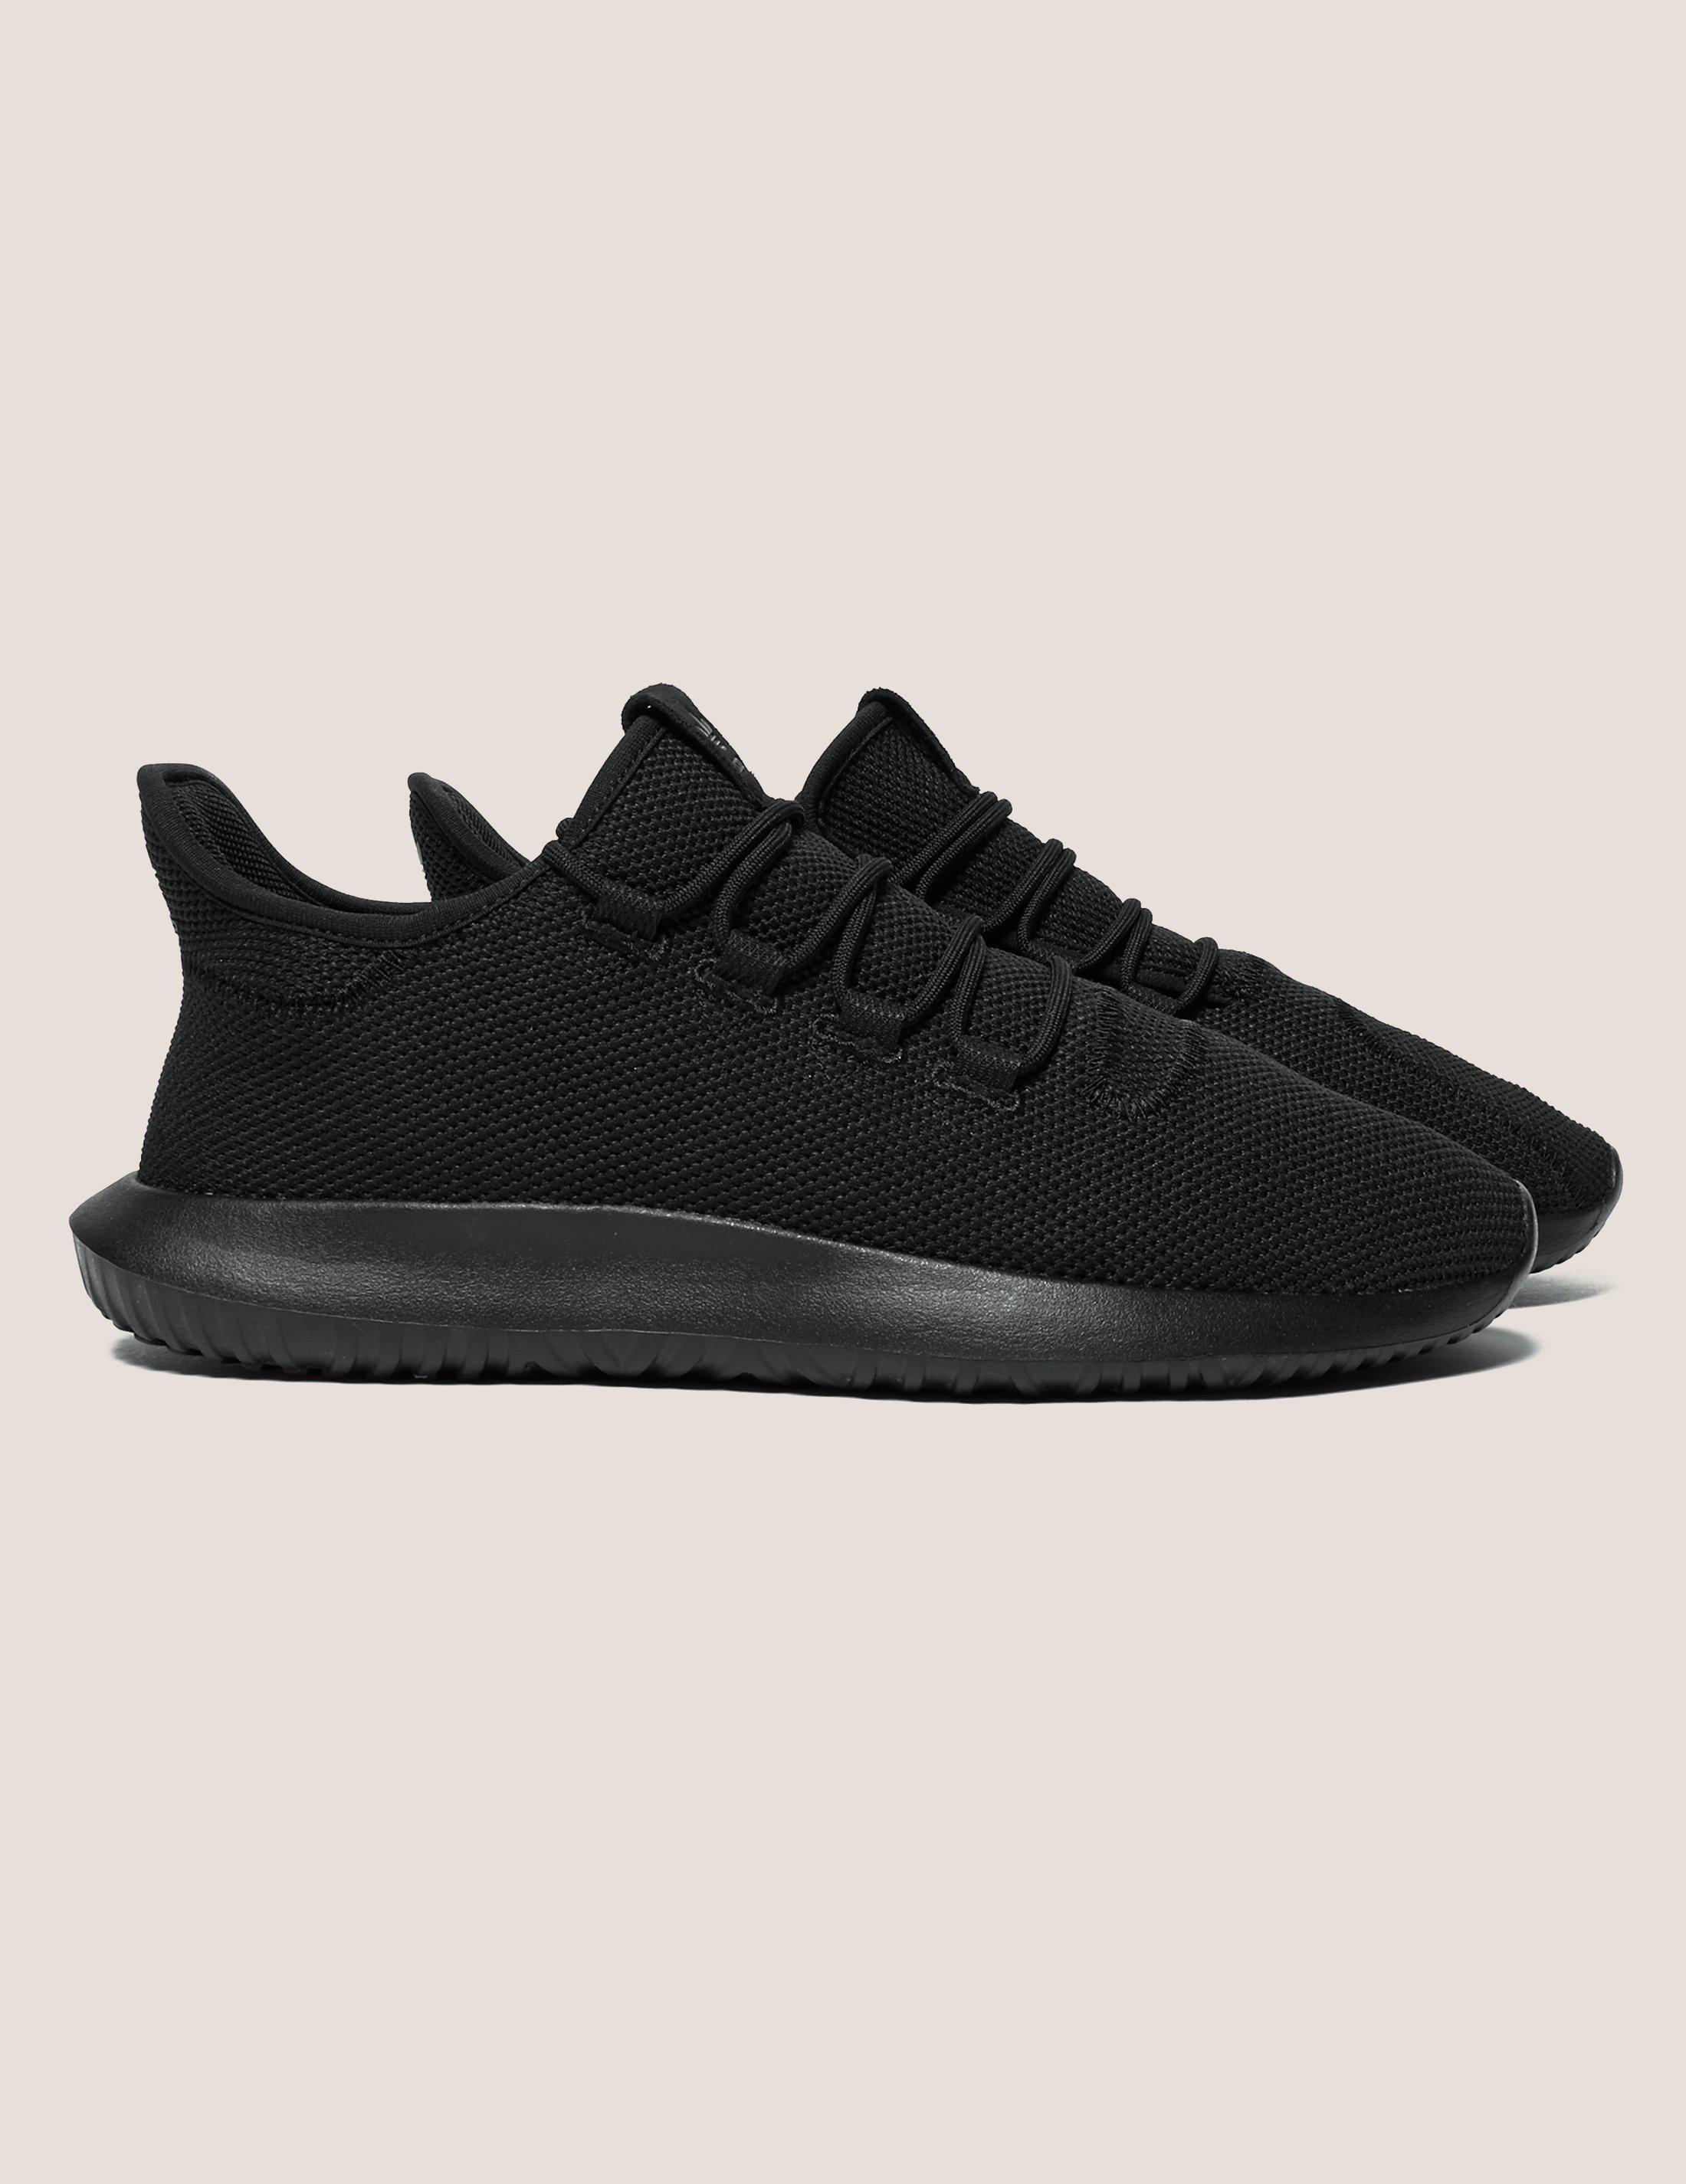 buy popular a0491 462c9 adidas Originals. Mens Tubular Shadow Black